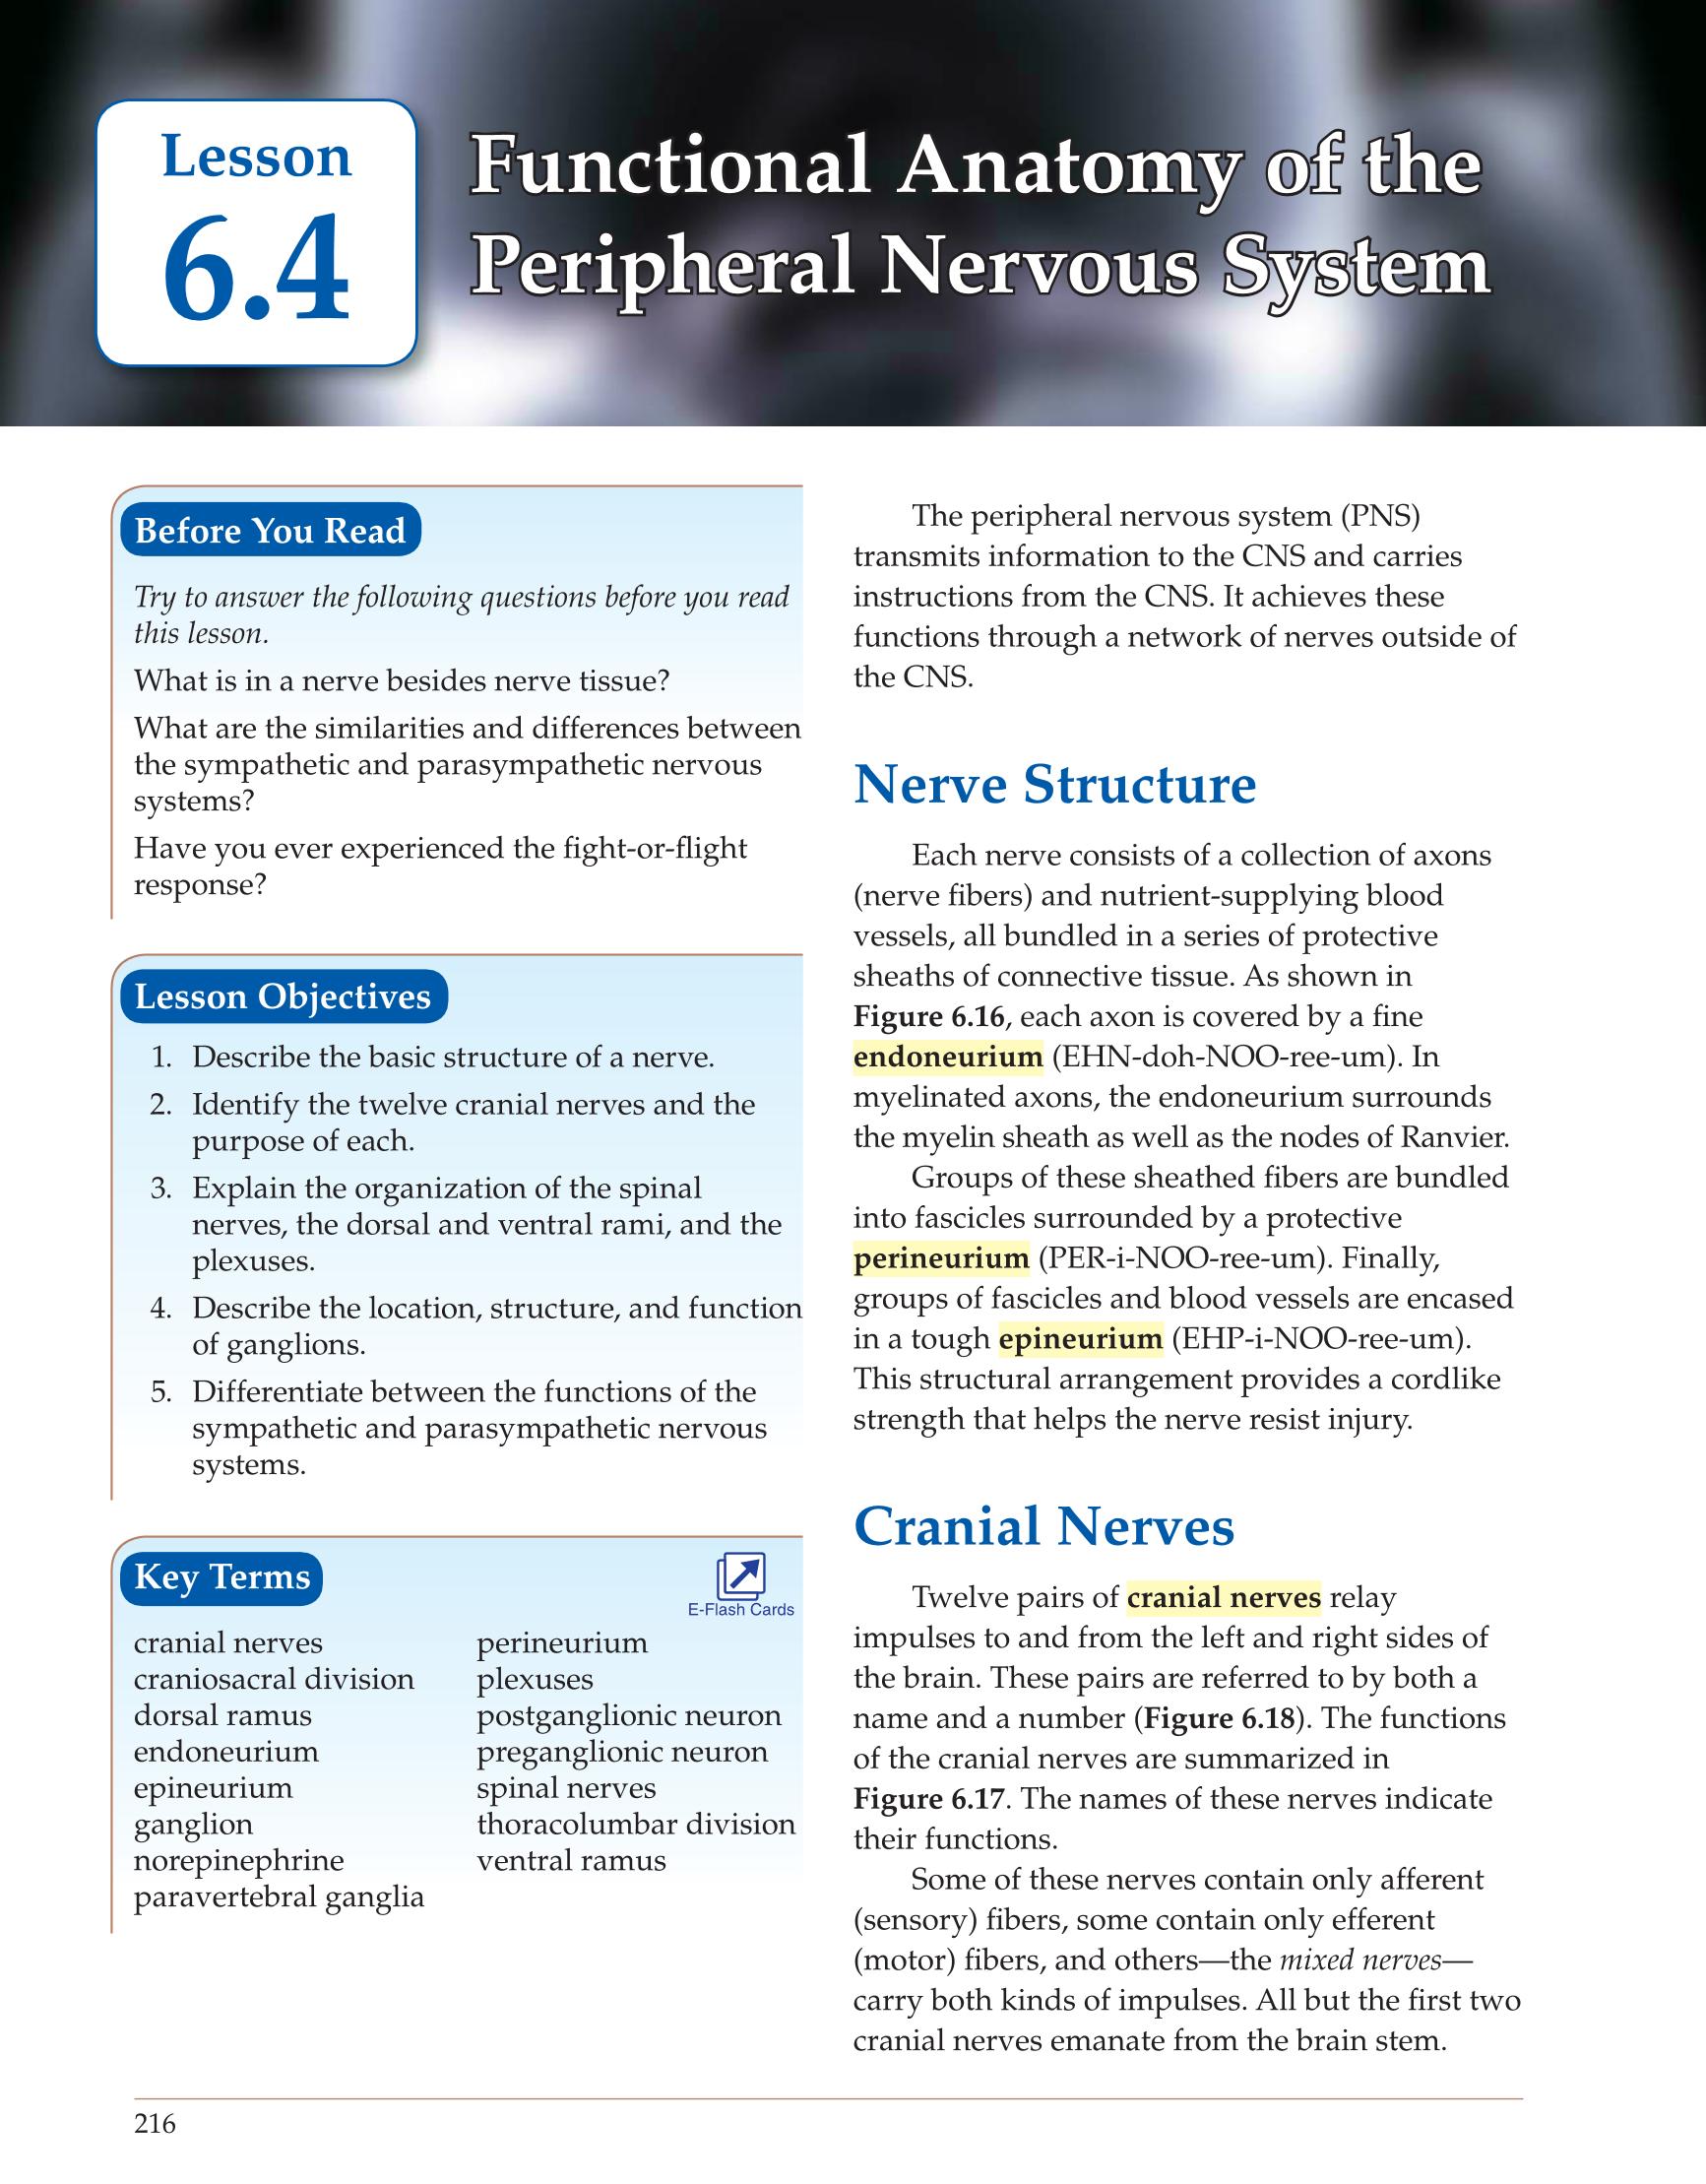 Chapter 7 Answer Keys Human Anatomy 6937210 - seafoodnet.info